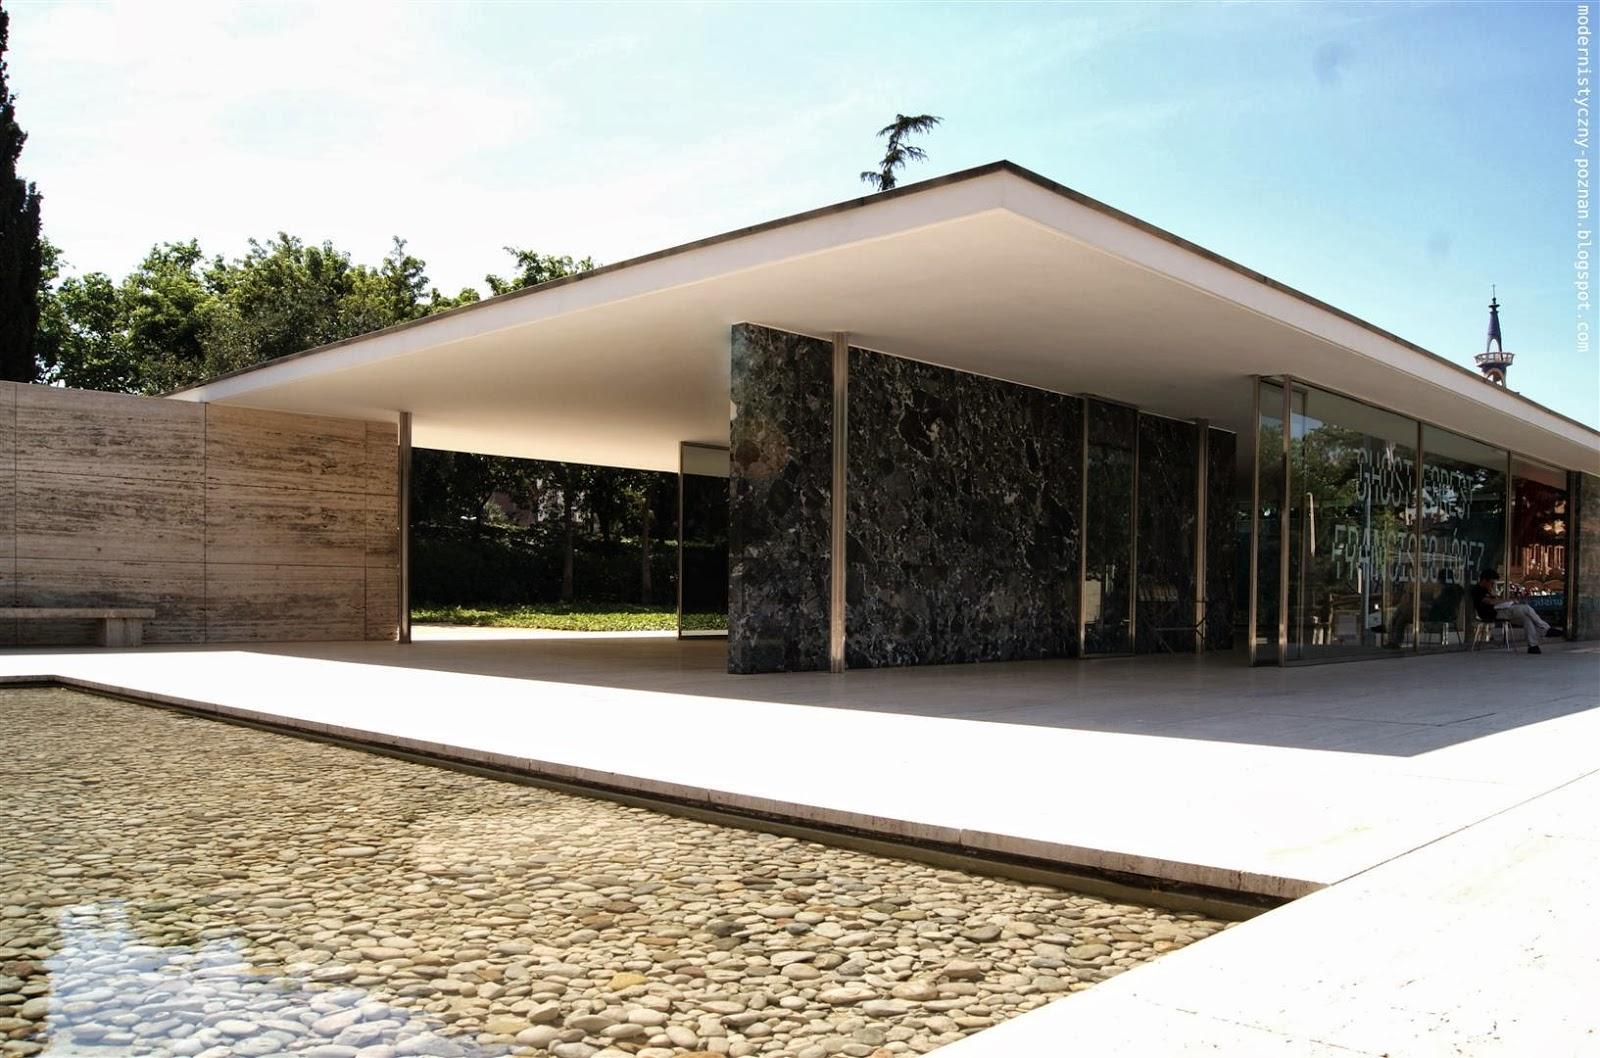 Pawilon Miesa van der Rohe w Barcelonie